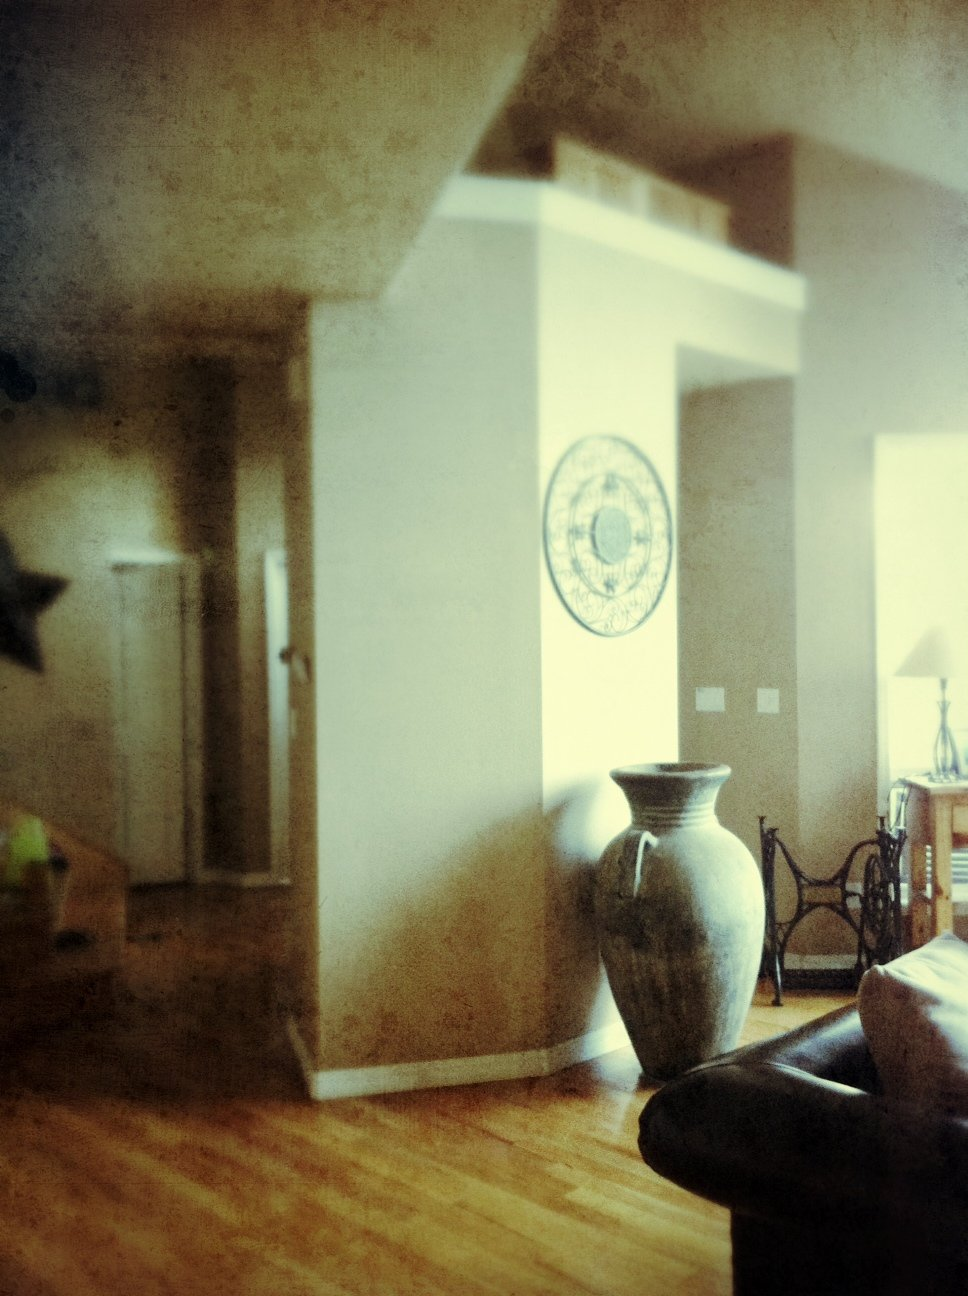 Home Decor From Colorado City Colorado Springs